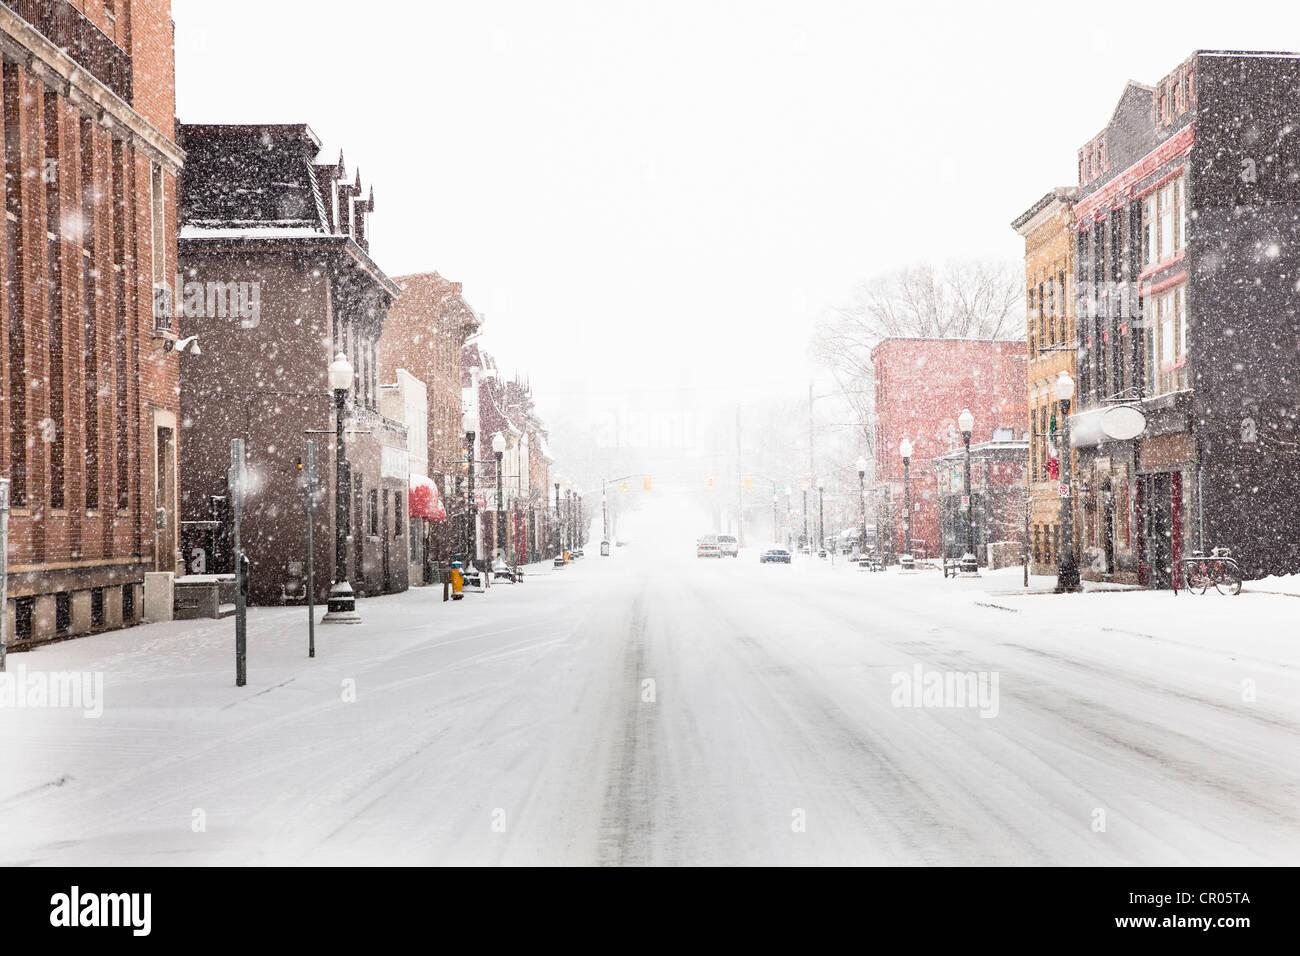 Snow falling on city street - Stock Image